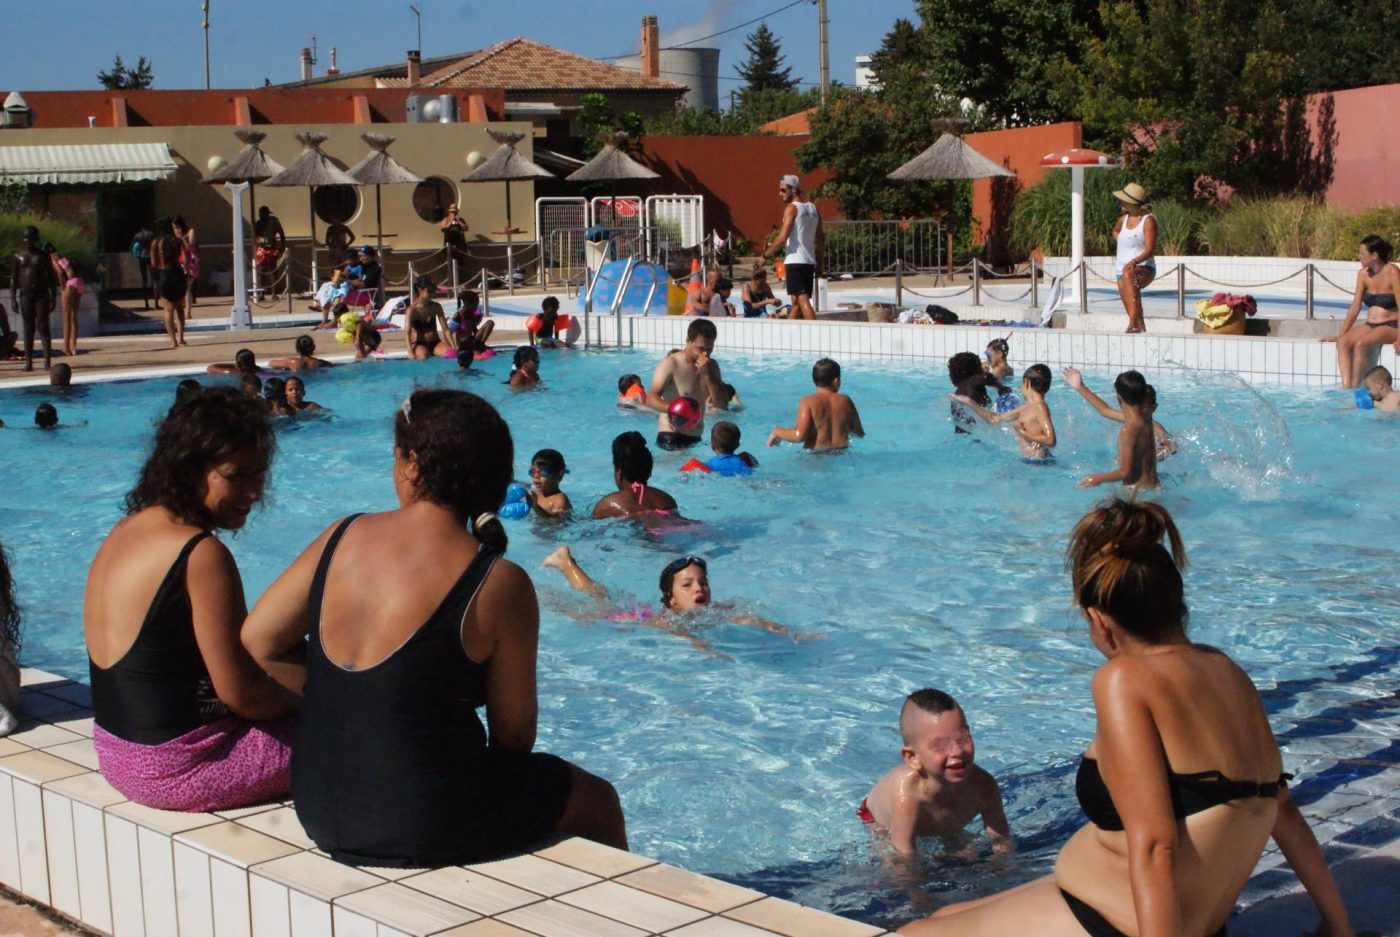 Piscines de fortune l 39 exode aquatique vers gardanne for Restaurant la piscine gardanne